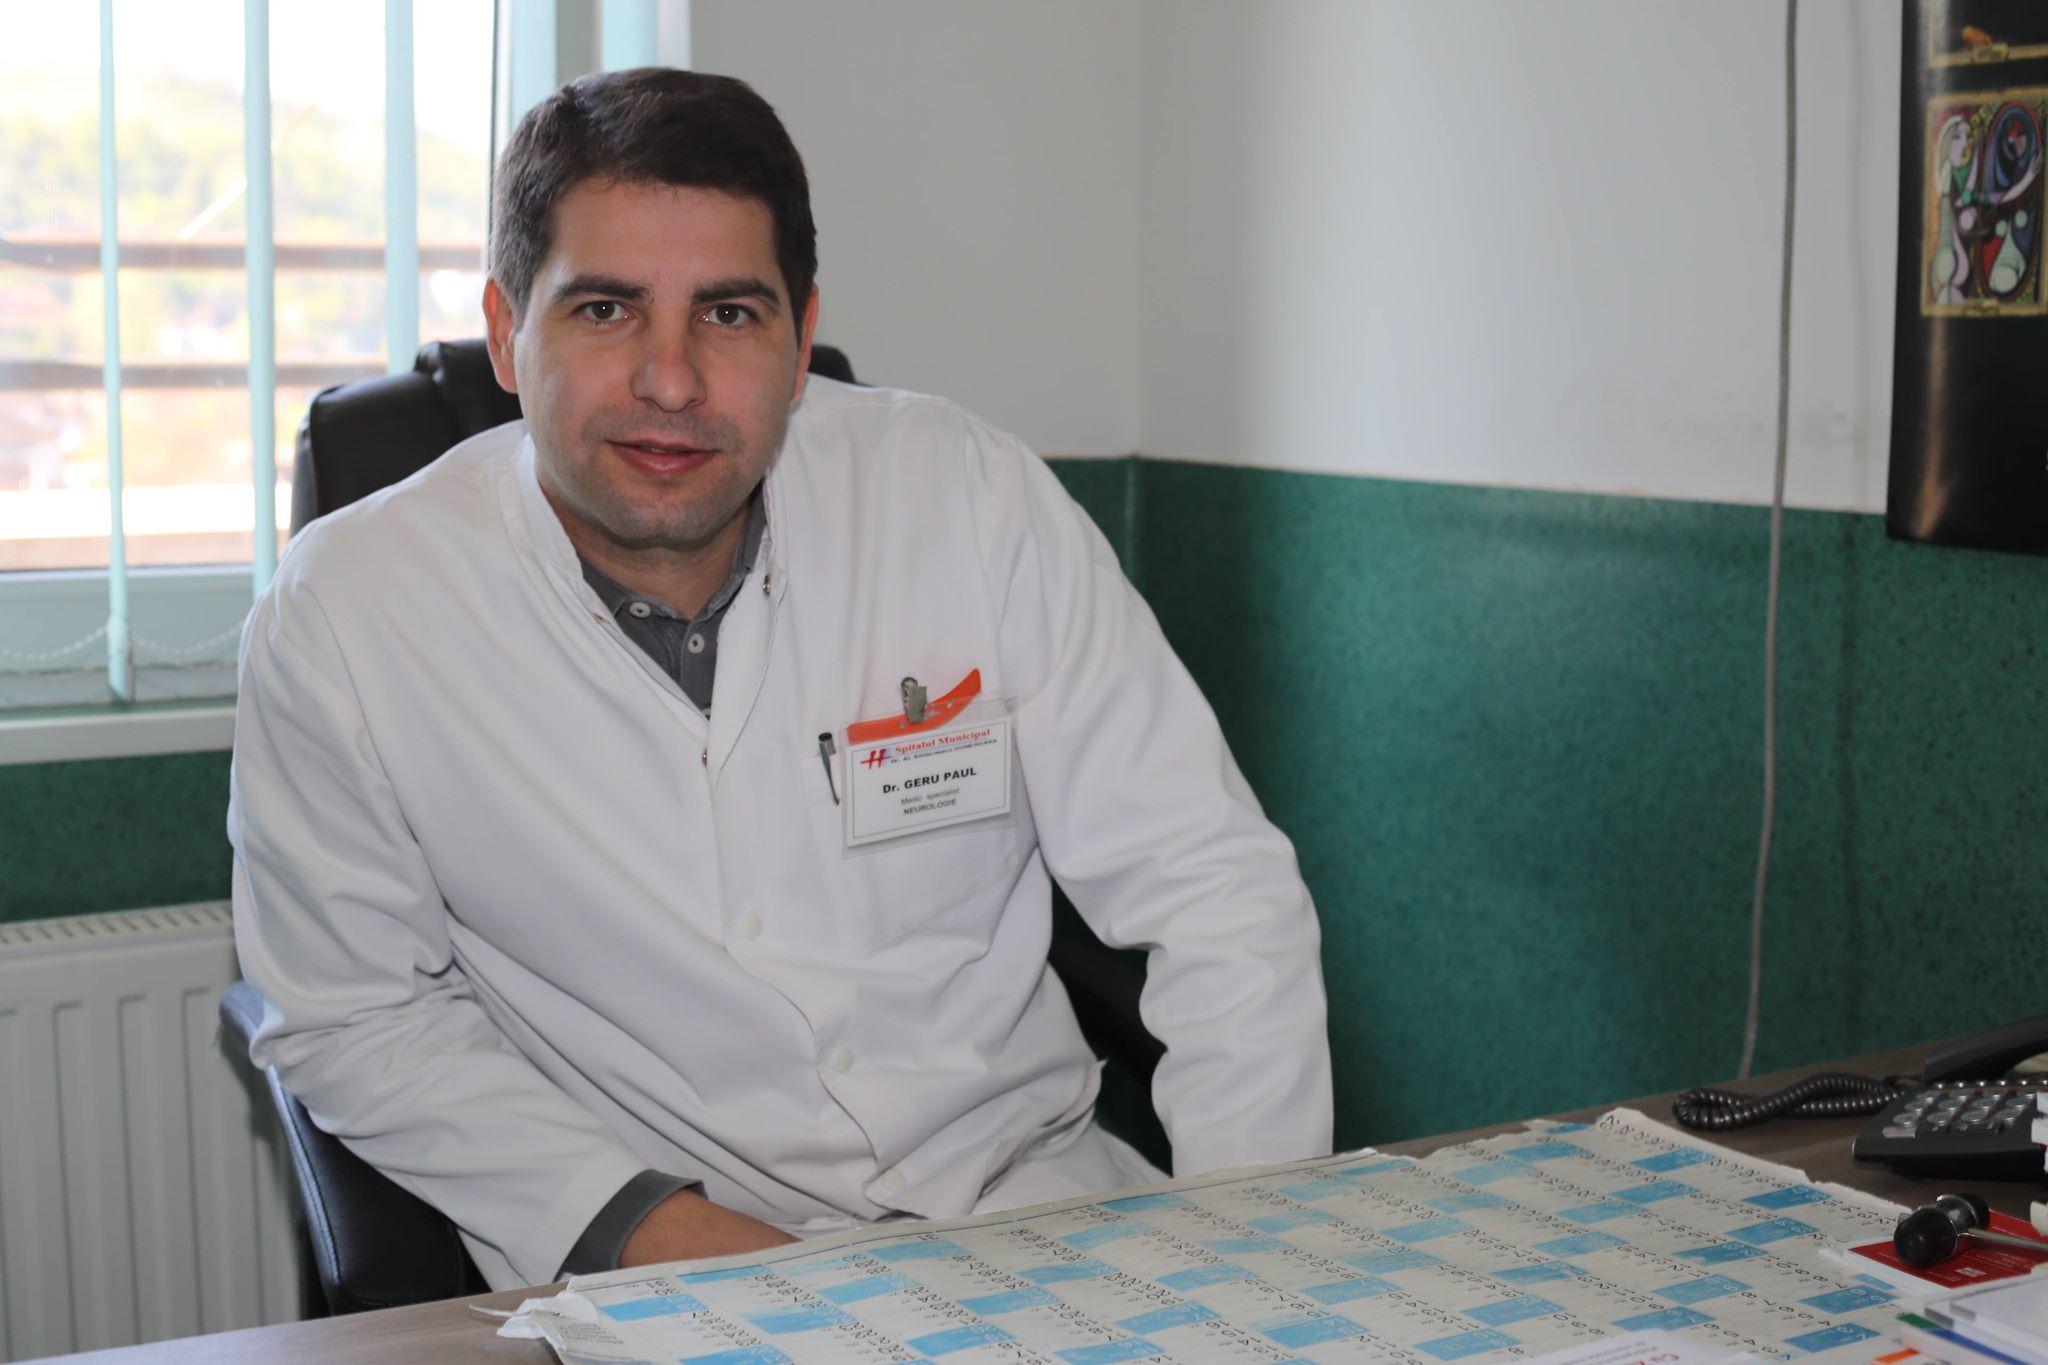 Dr. Paul Geru